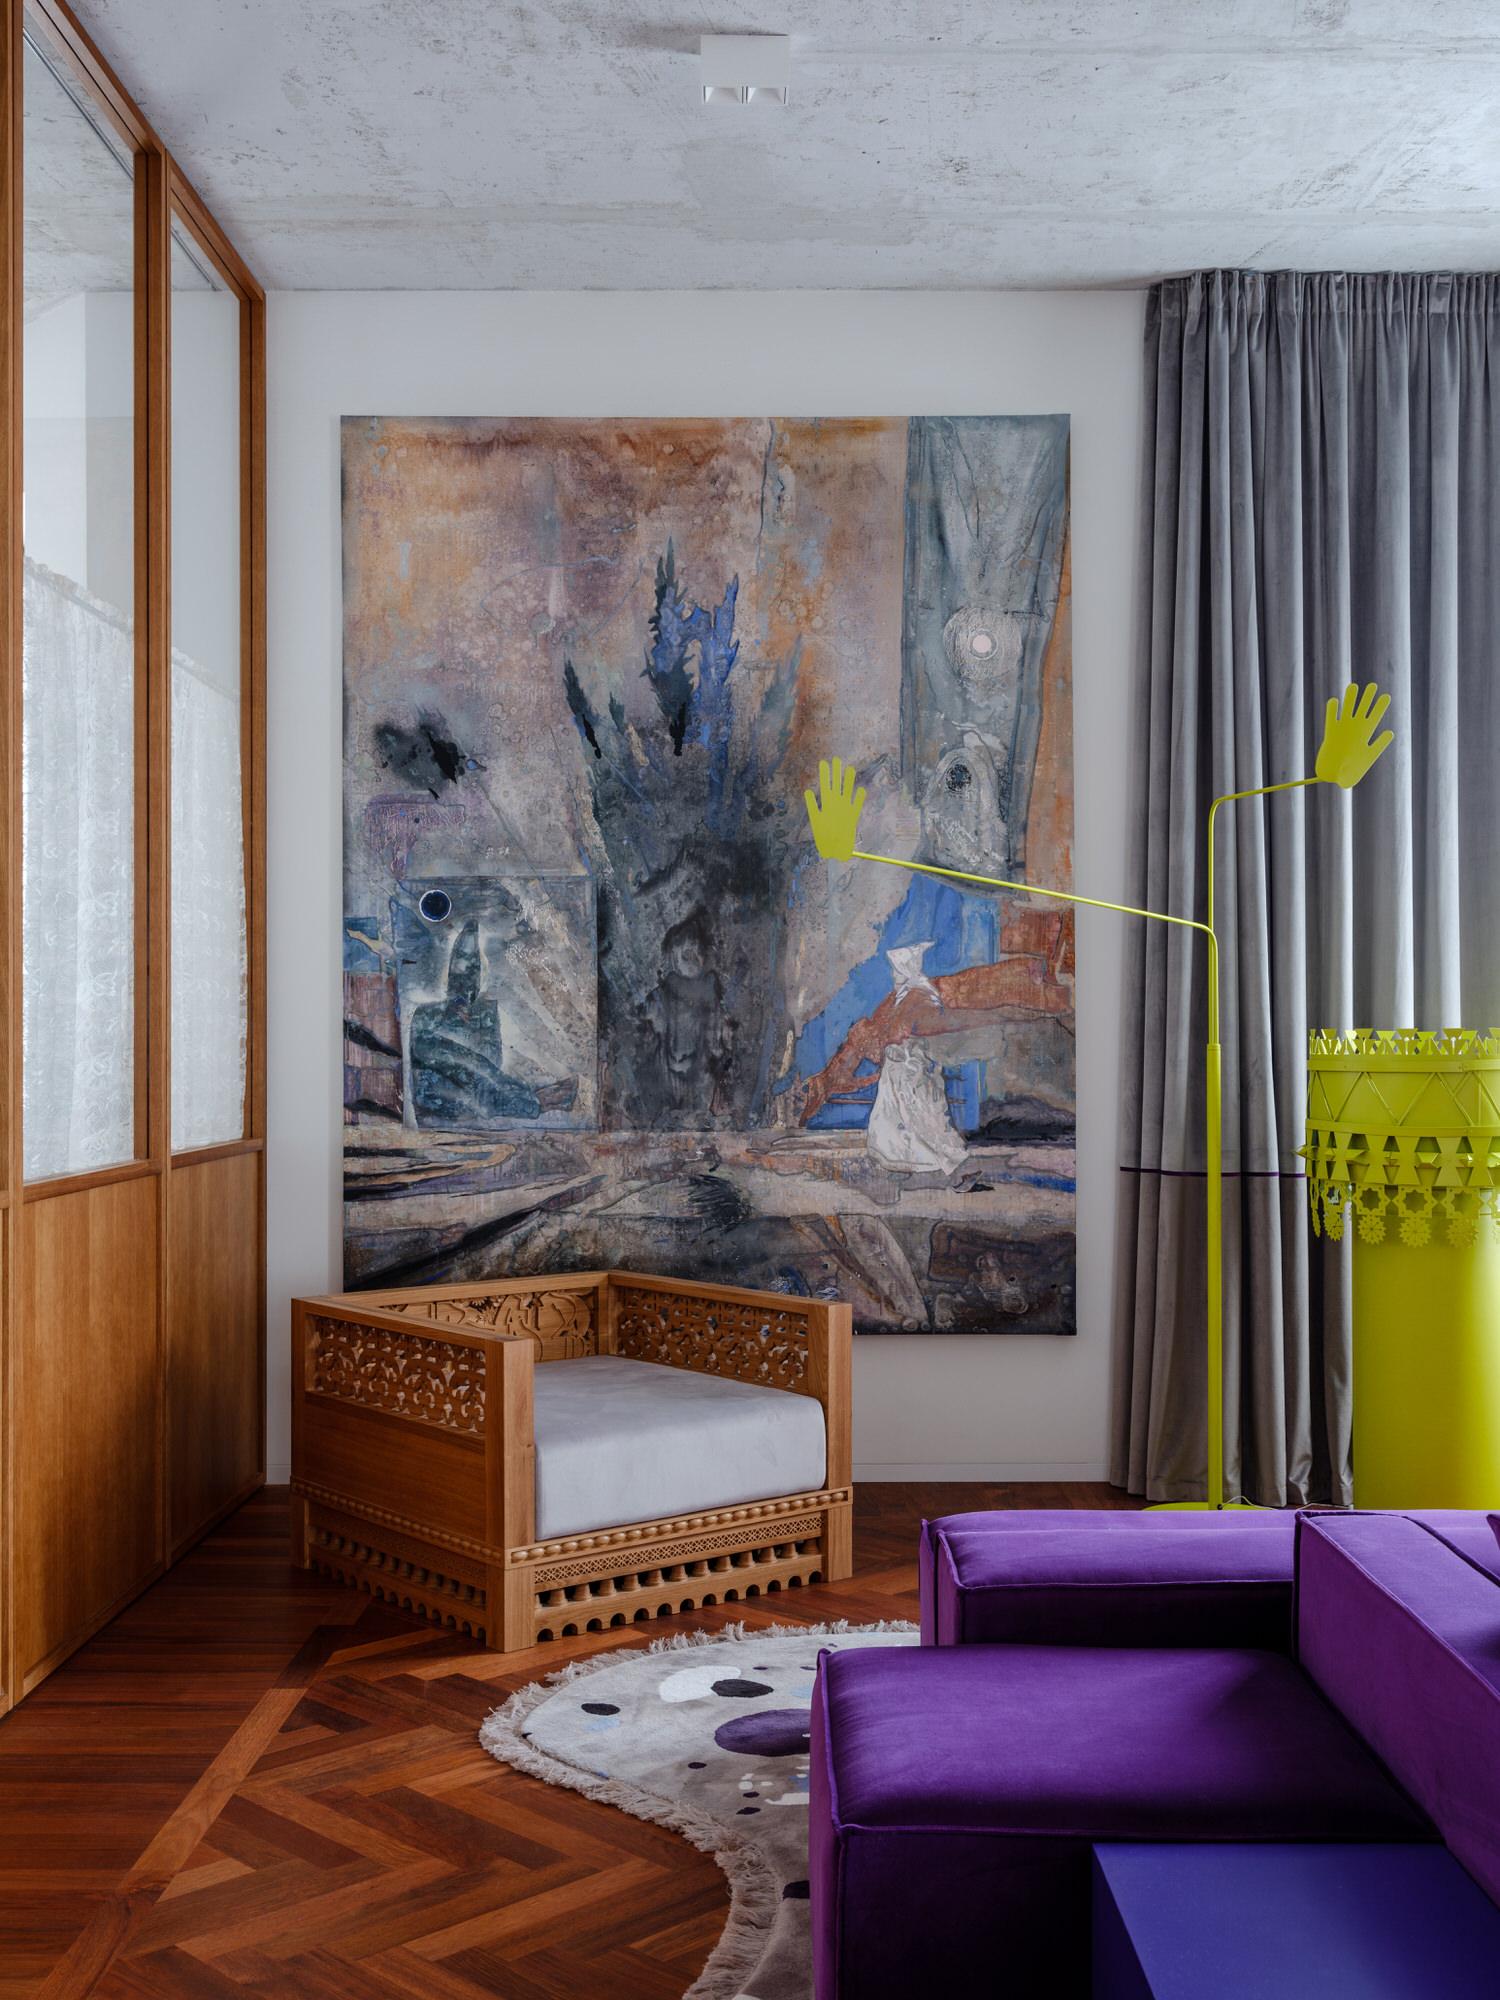 Ksenia Chilingarova Apartment in Moscow by Crosby Studios.